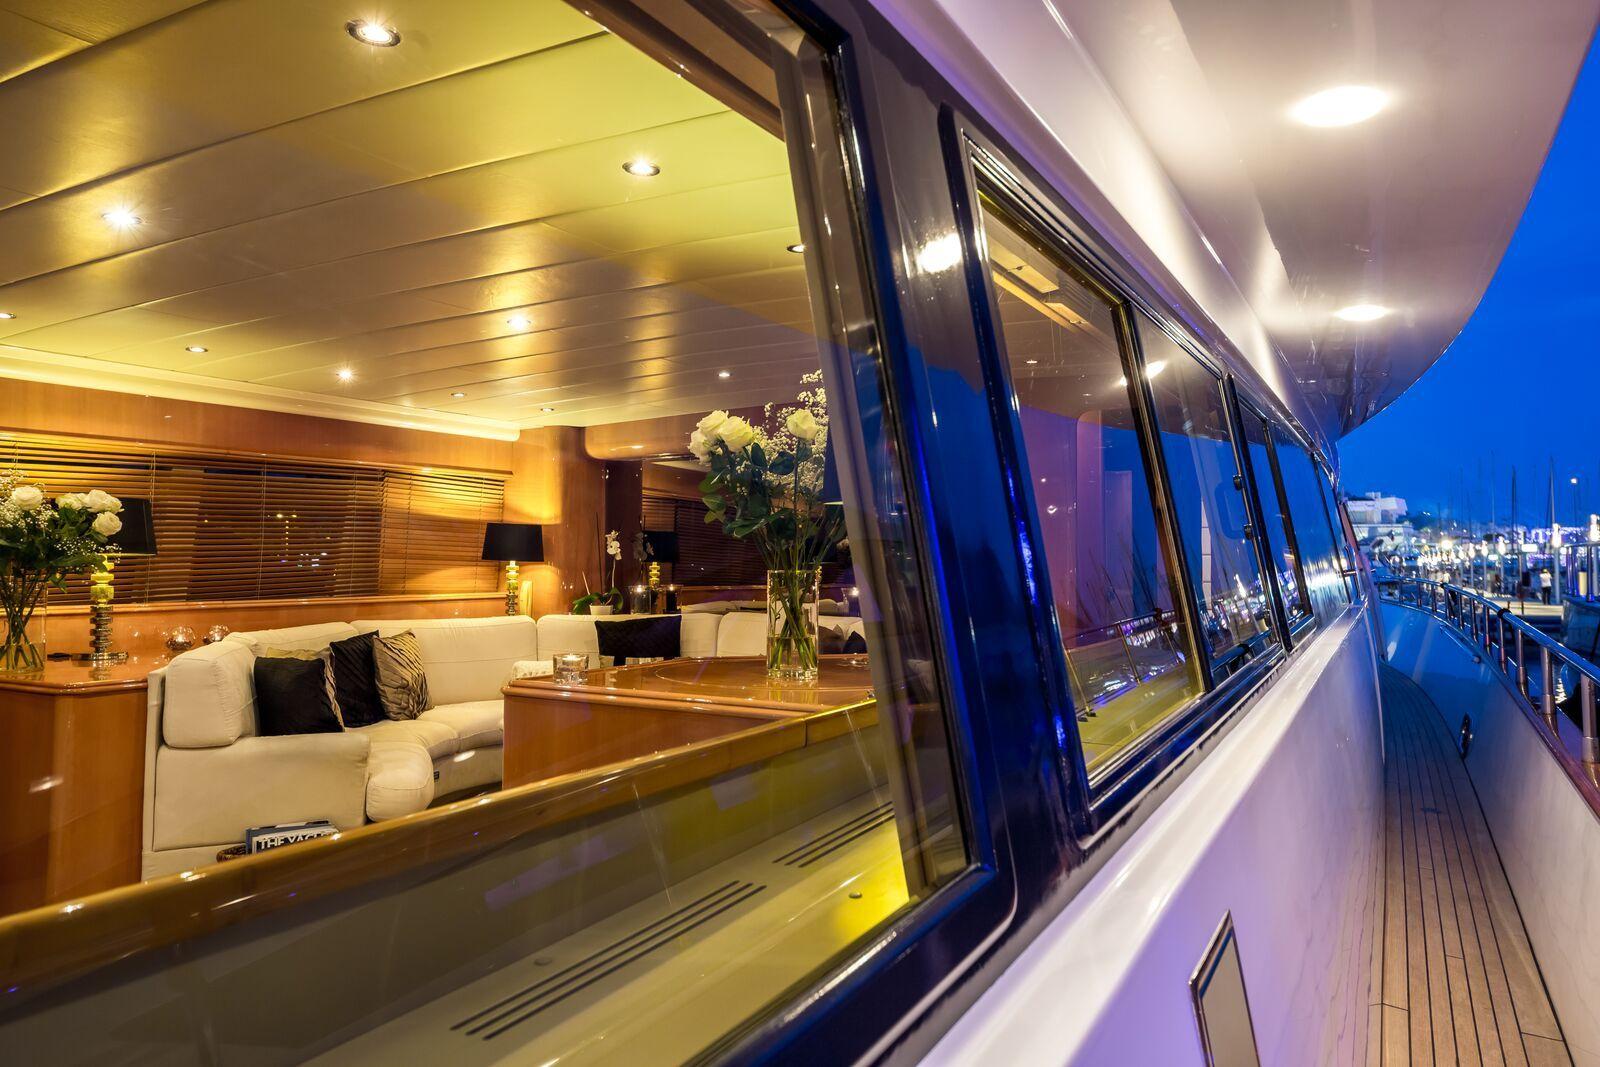 INDULGENCE OF POOLE Mangusta 86 Luxury Superyacht Walkway